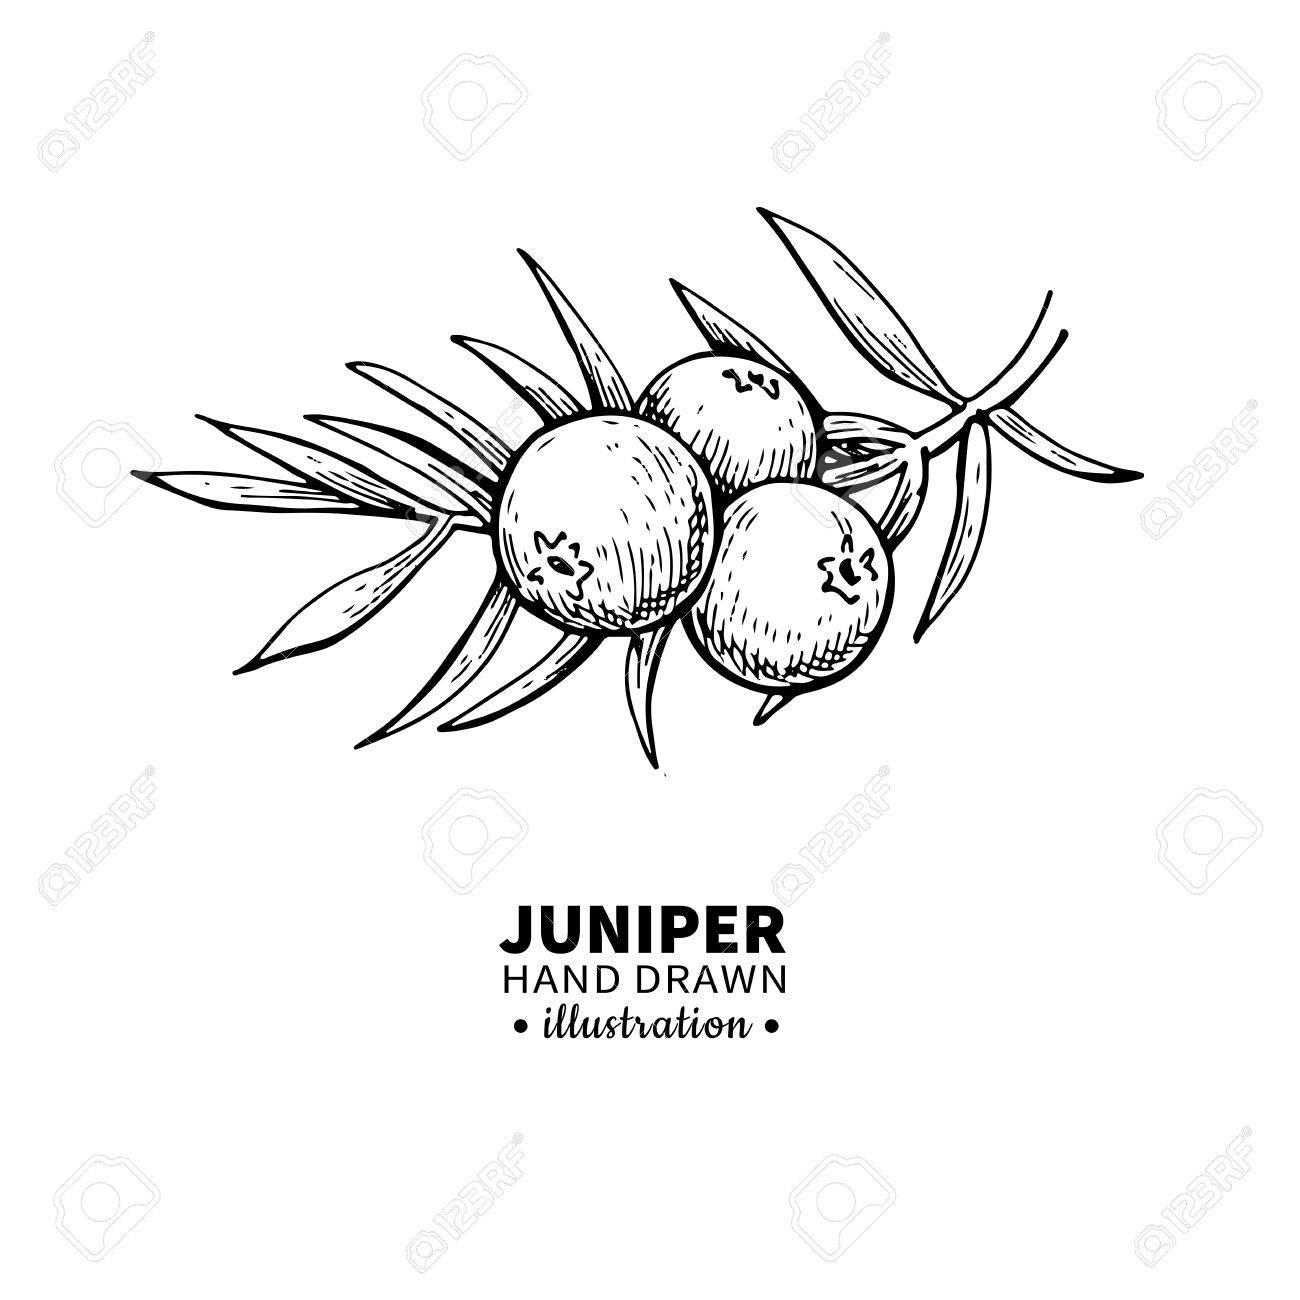 520 Juniper Berries Stock Vector Illustration And Royalty Free